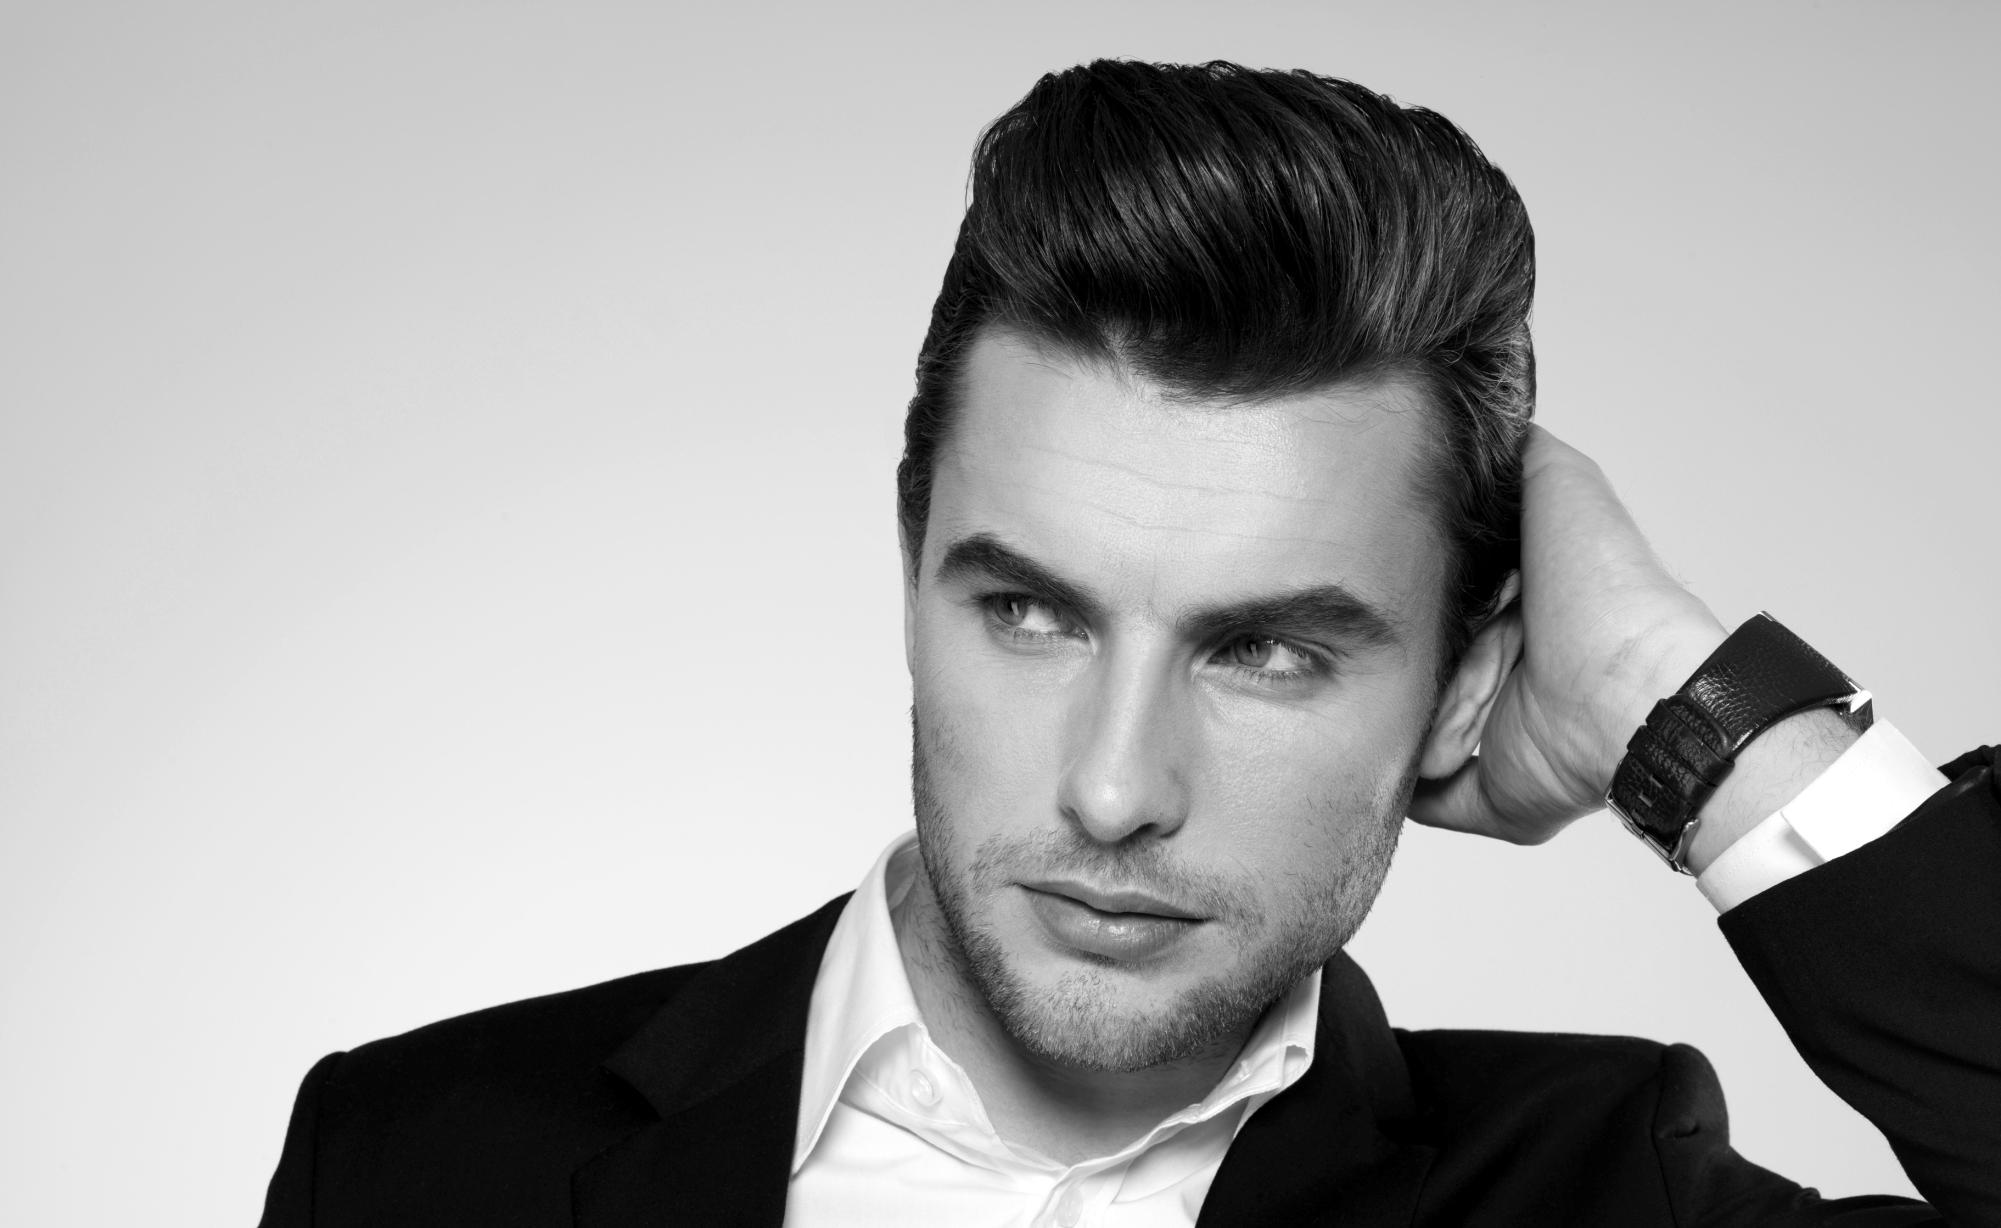 Mens Parted Hair Styles | Haircut Measurements | Mens Quiff